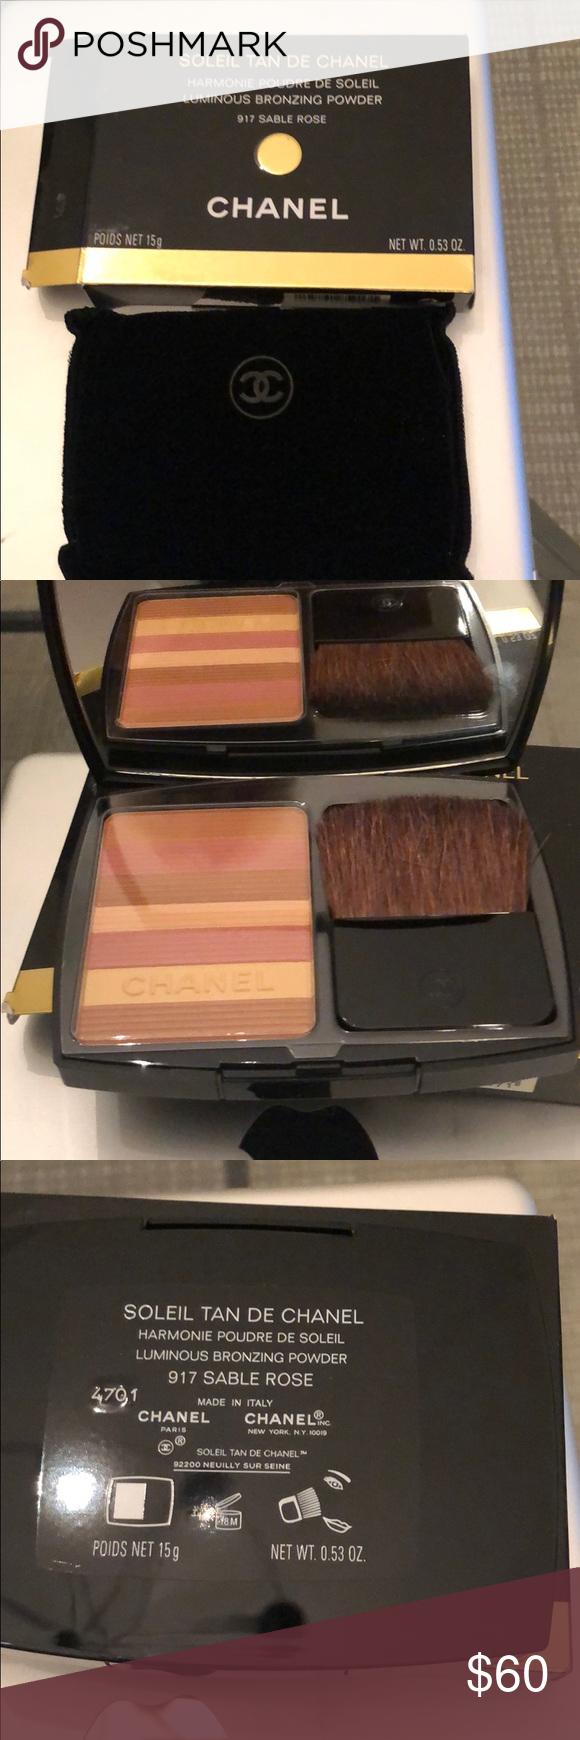 5c42b091 Luminous bronzing powder Sable beige CHANEL Makeup Bronzer | My Posh ...